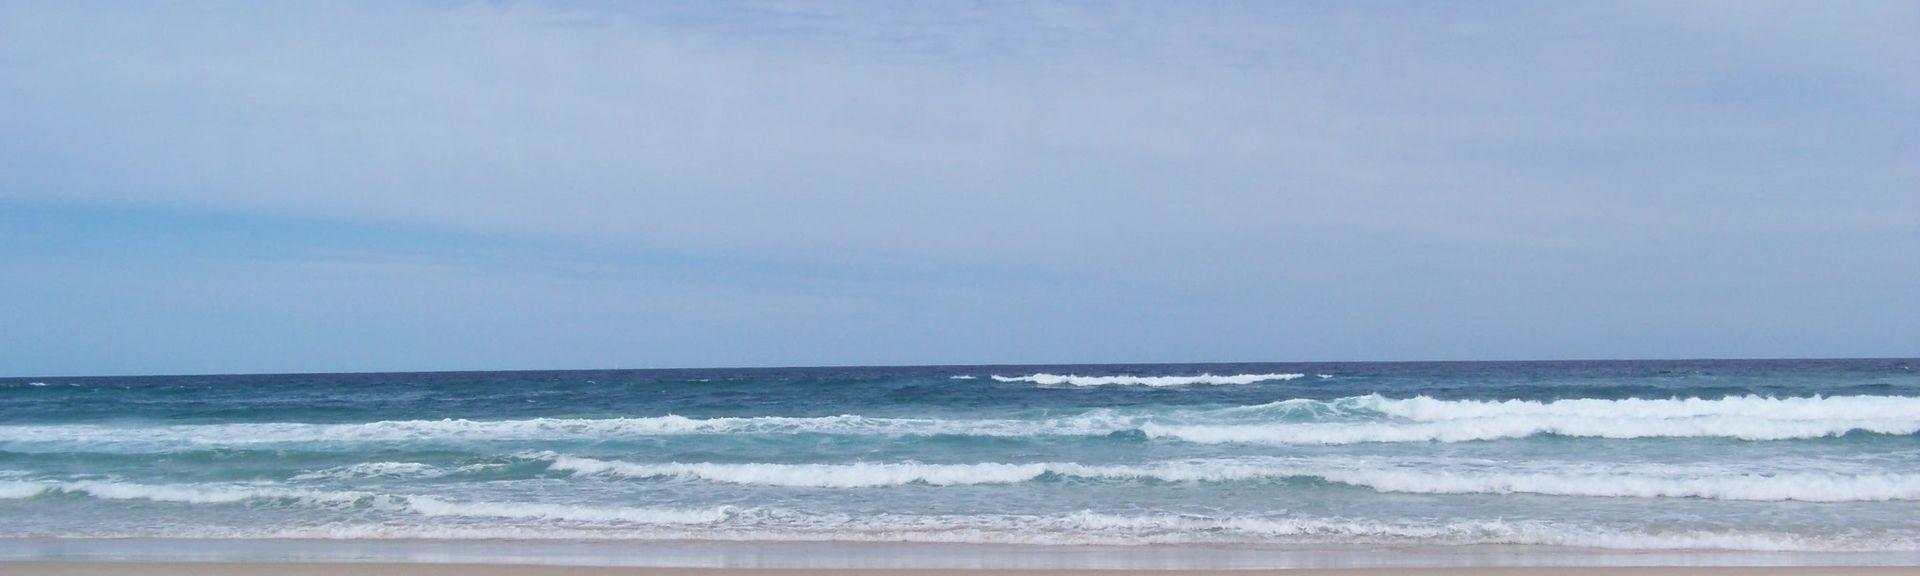 Ormeau, Gold Coast, Queensland, Australia